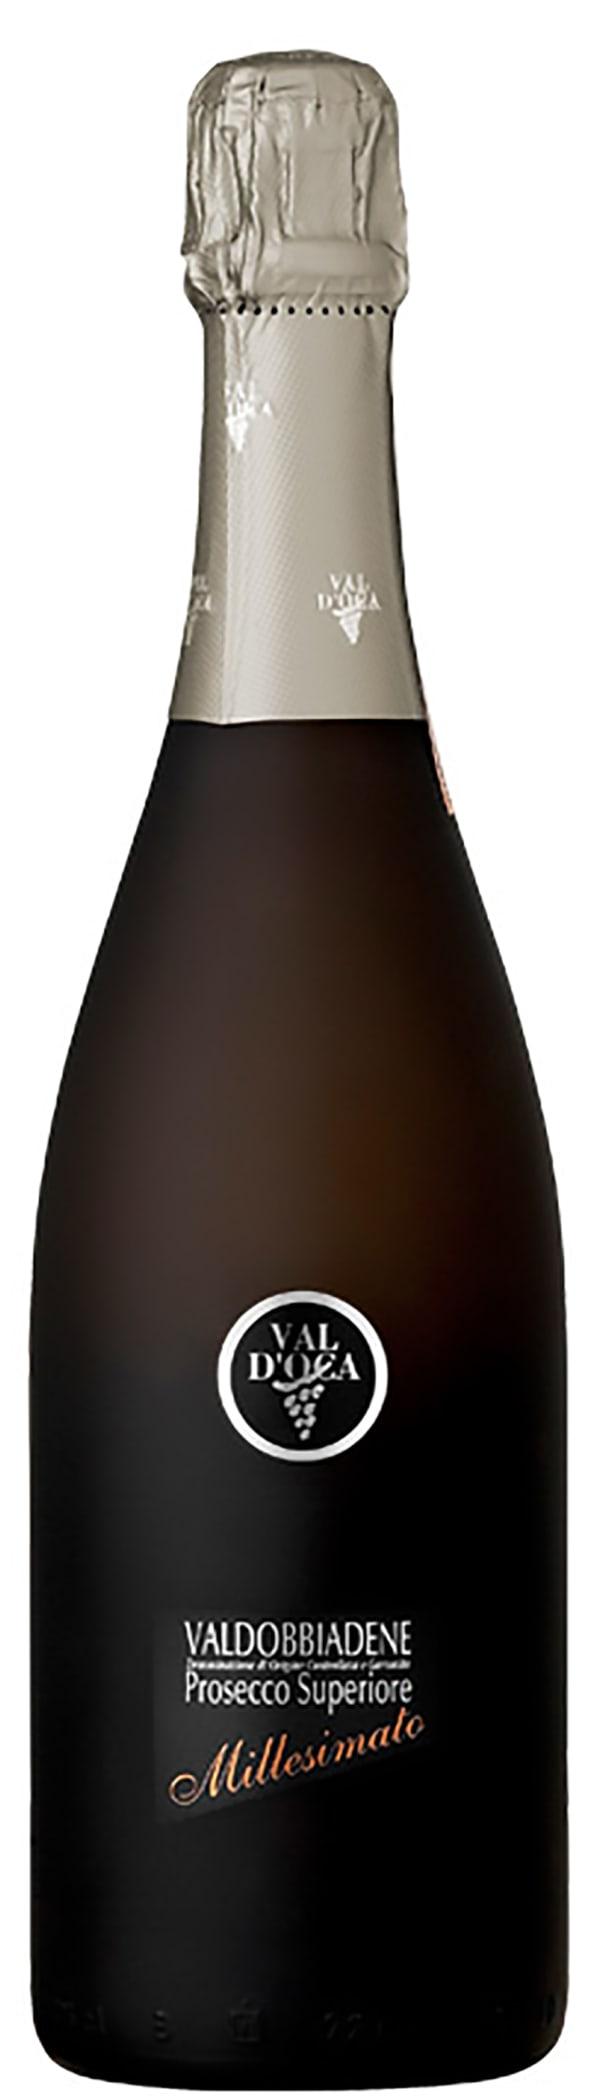 Val d'Oca Millesimato Prosecco Extra Dry 2015